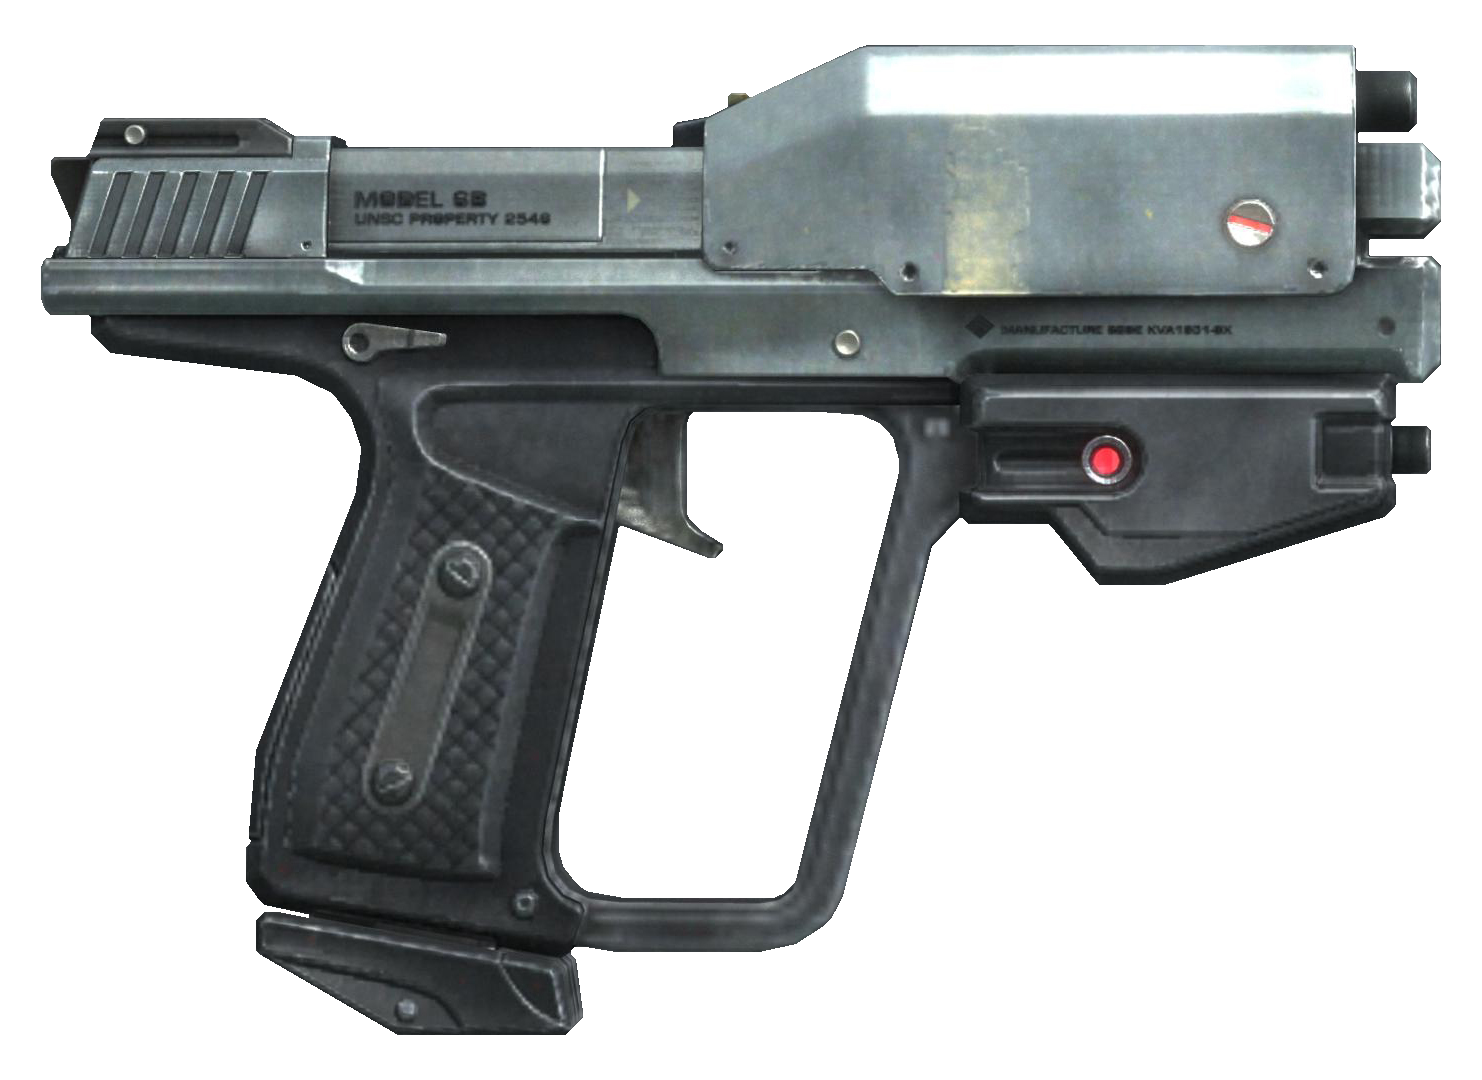 Print Page - Halo Reach M6G Foam Pistol Prop (pic heavy)